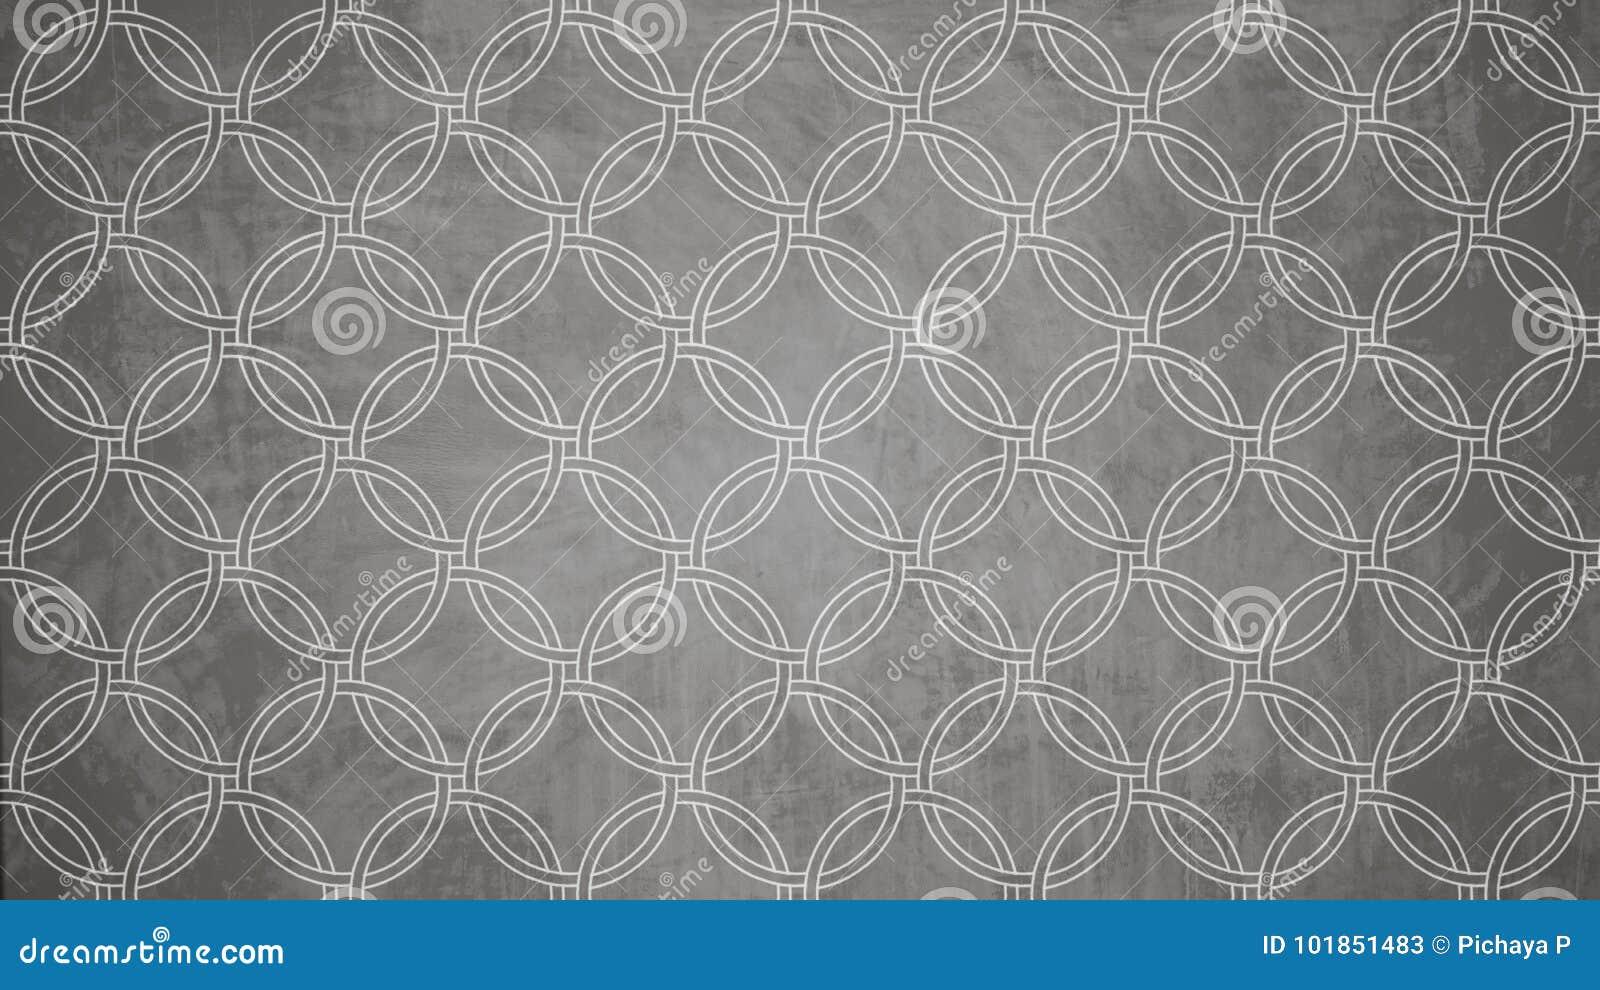 Sacred geometry circle stamp pattern shape on wall pattern texture.